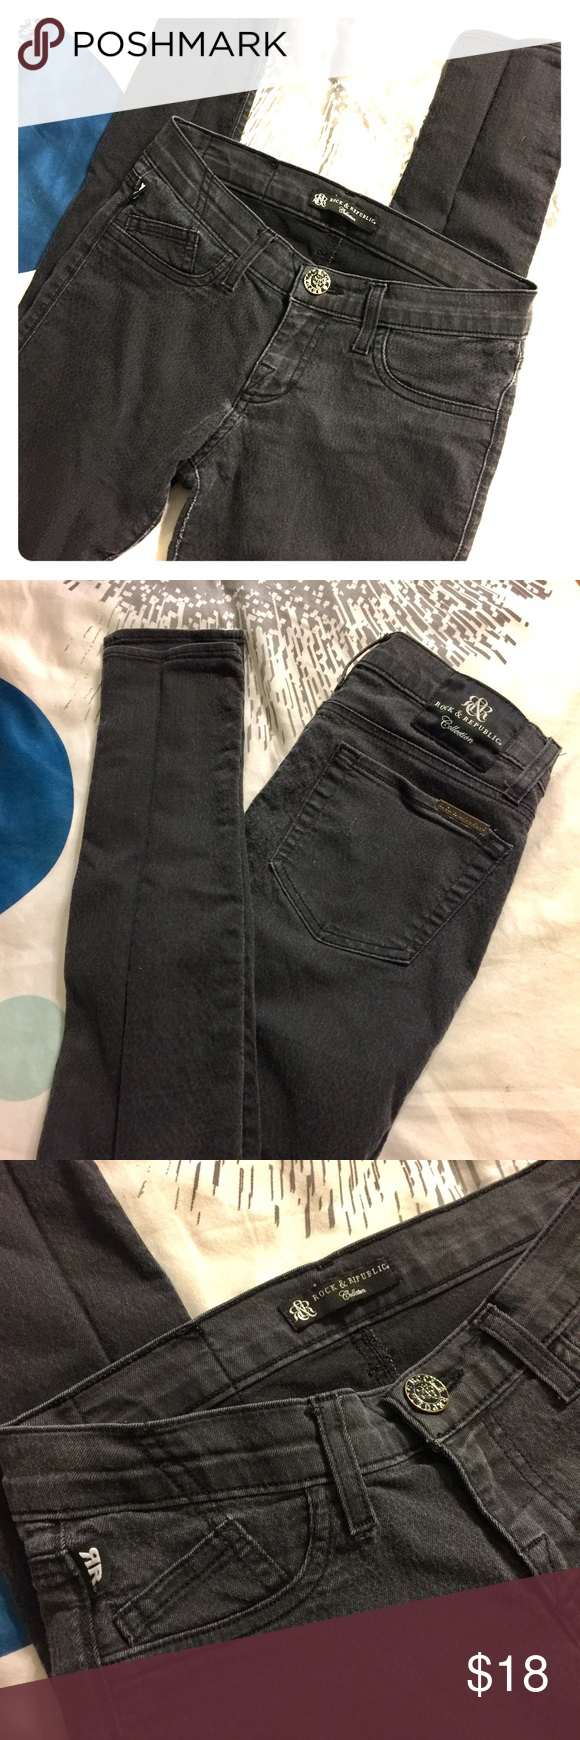 "Rock & Republic 🎸skinnies Skinny stretch Rock & Republic skinny legging jeans. Washed black, 5 pocket, 30"" inseam. Size EU 25/US 0. Rock & Republic Jeans Skinny"